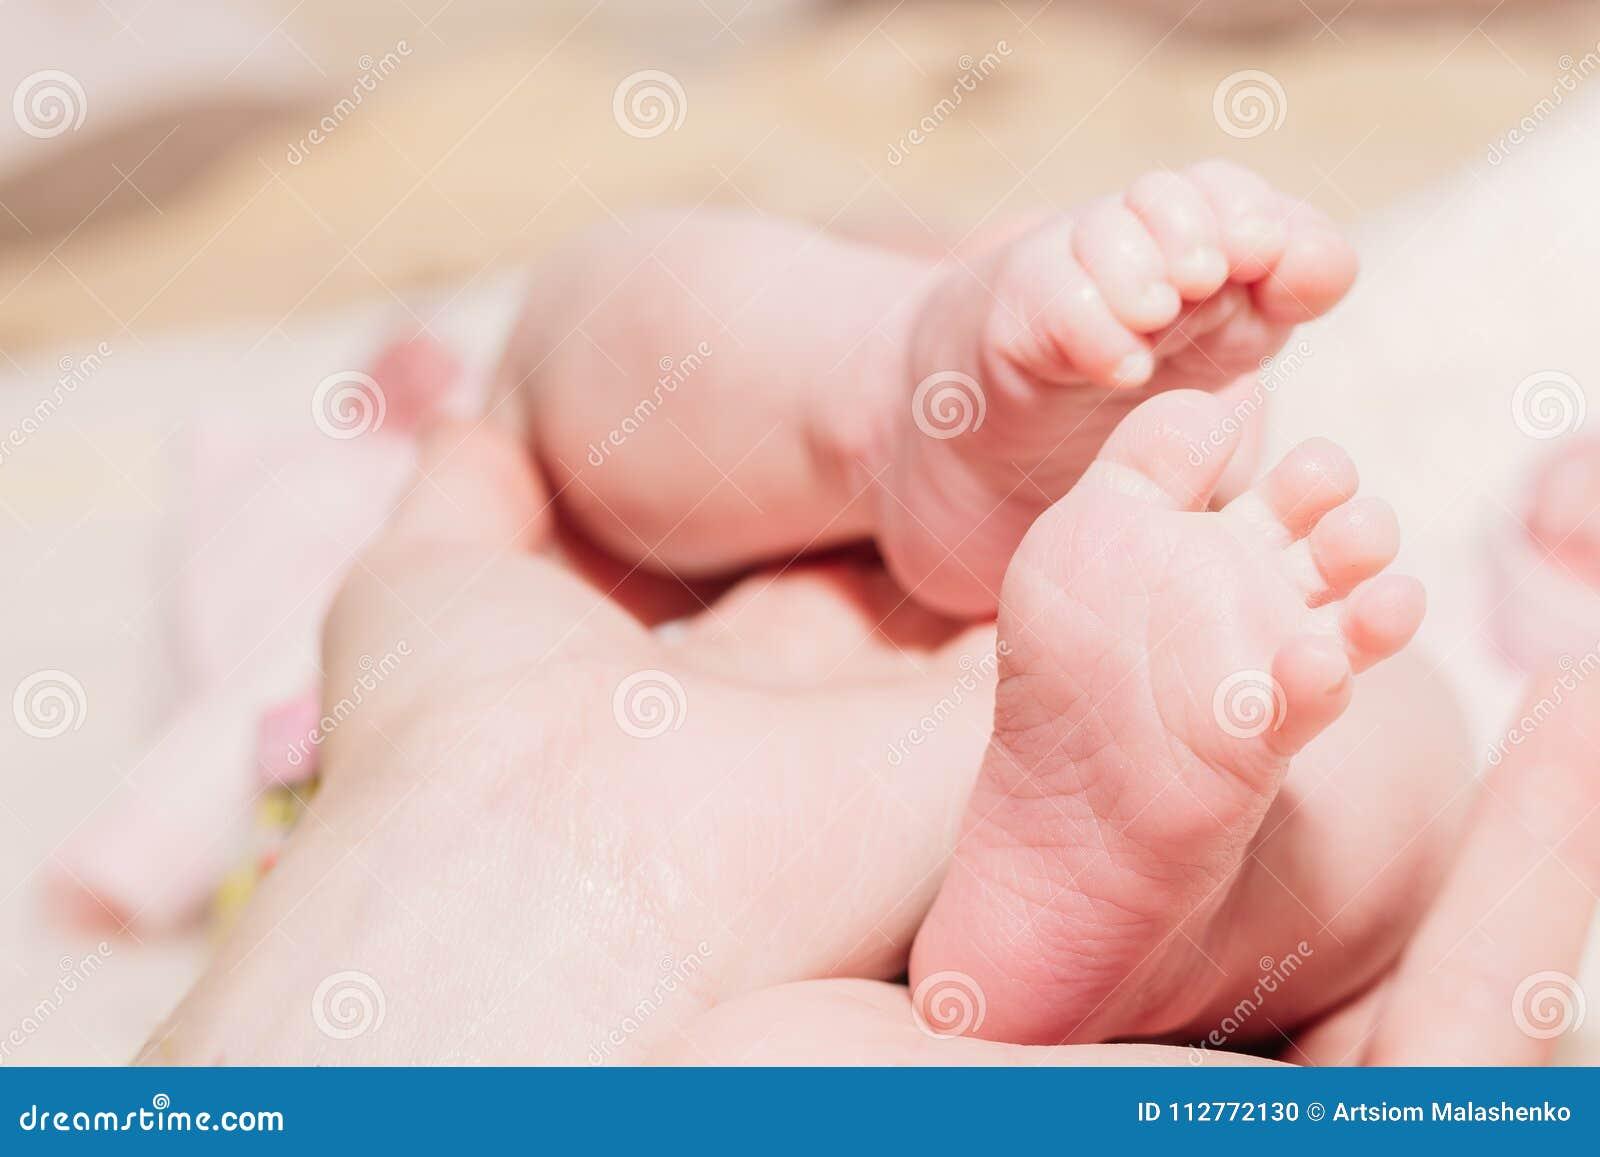 Beautiful legs of a newborn baby closeup